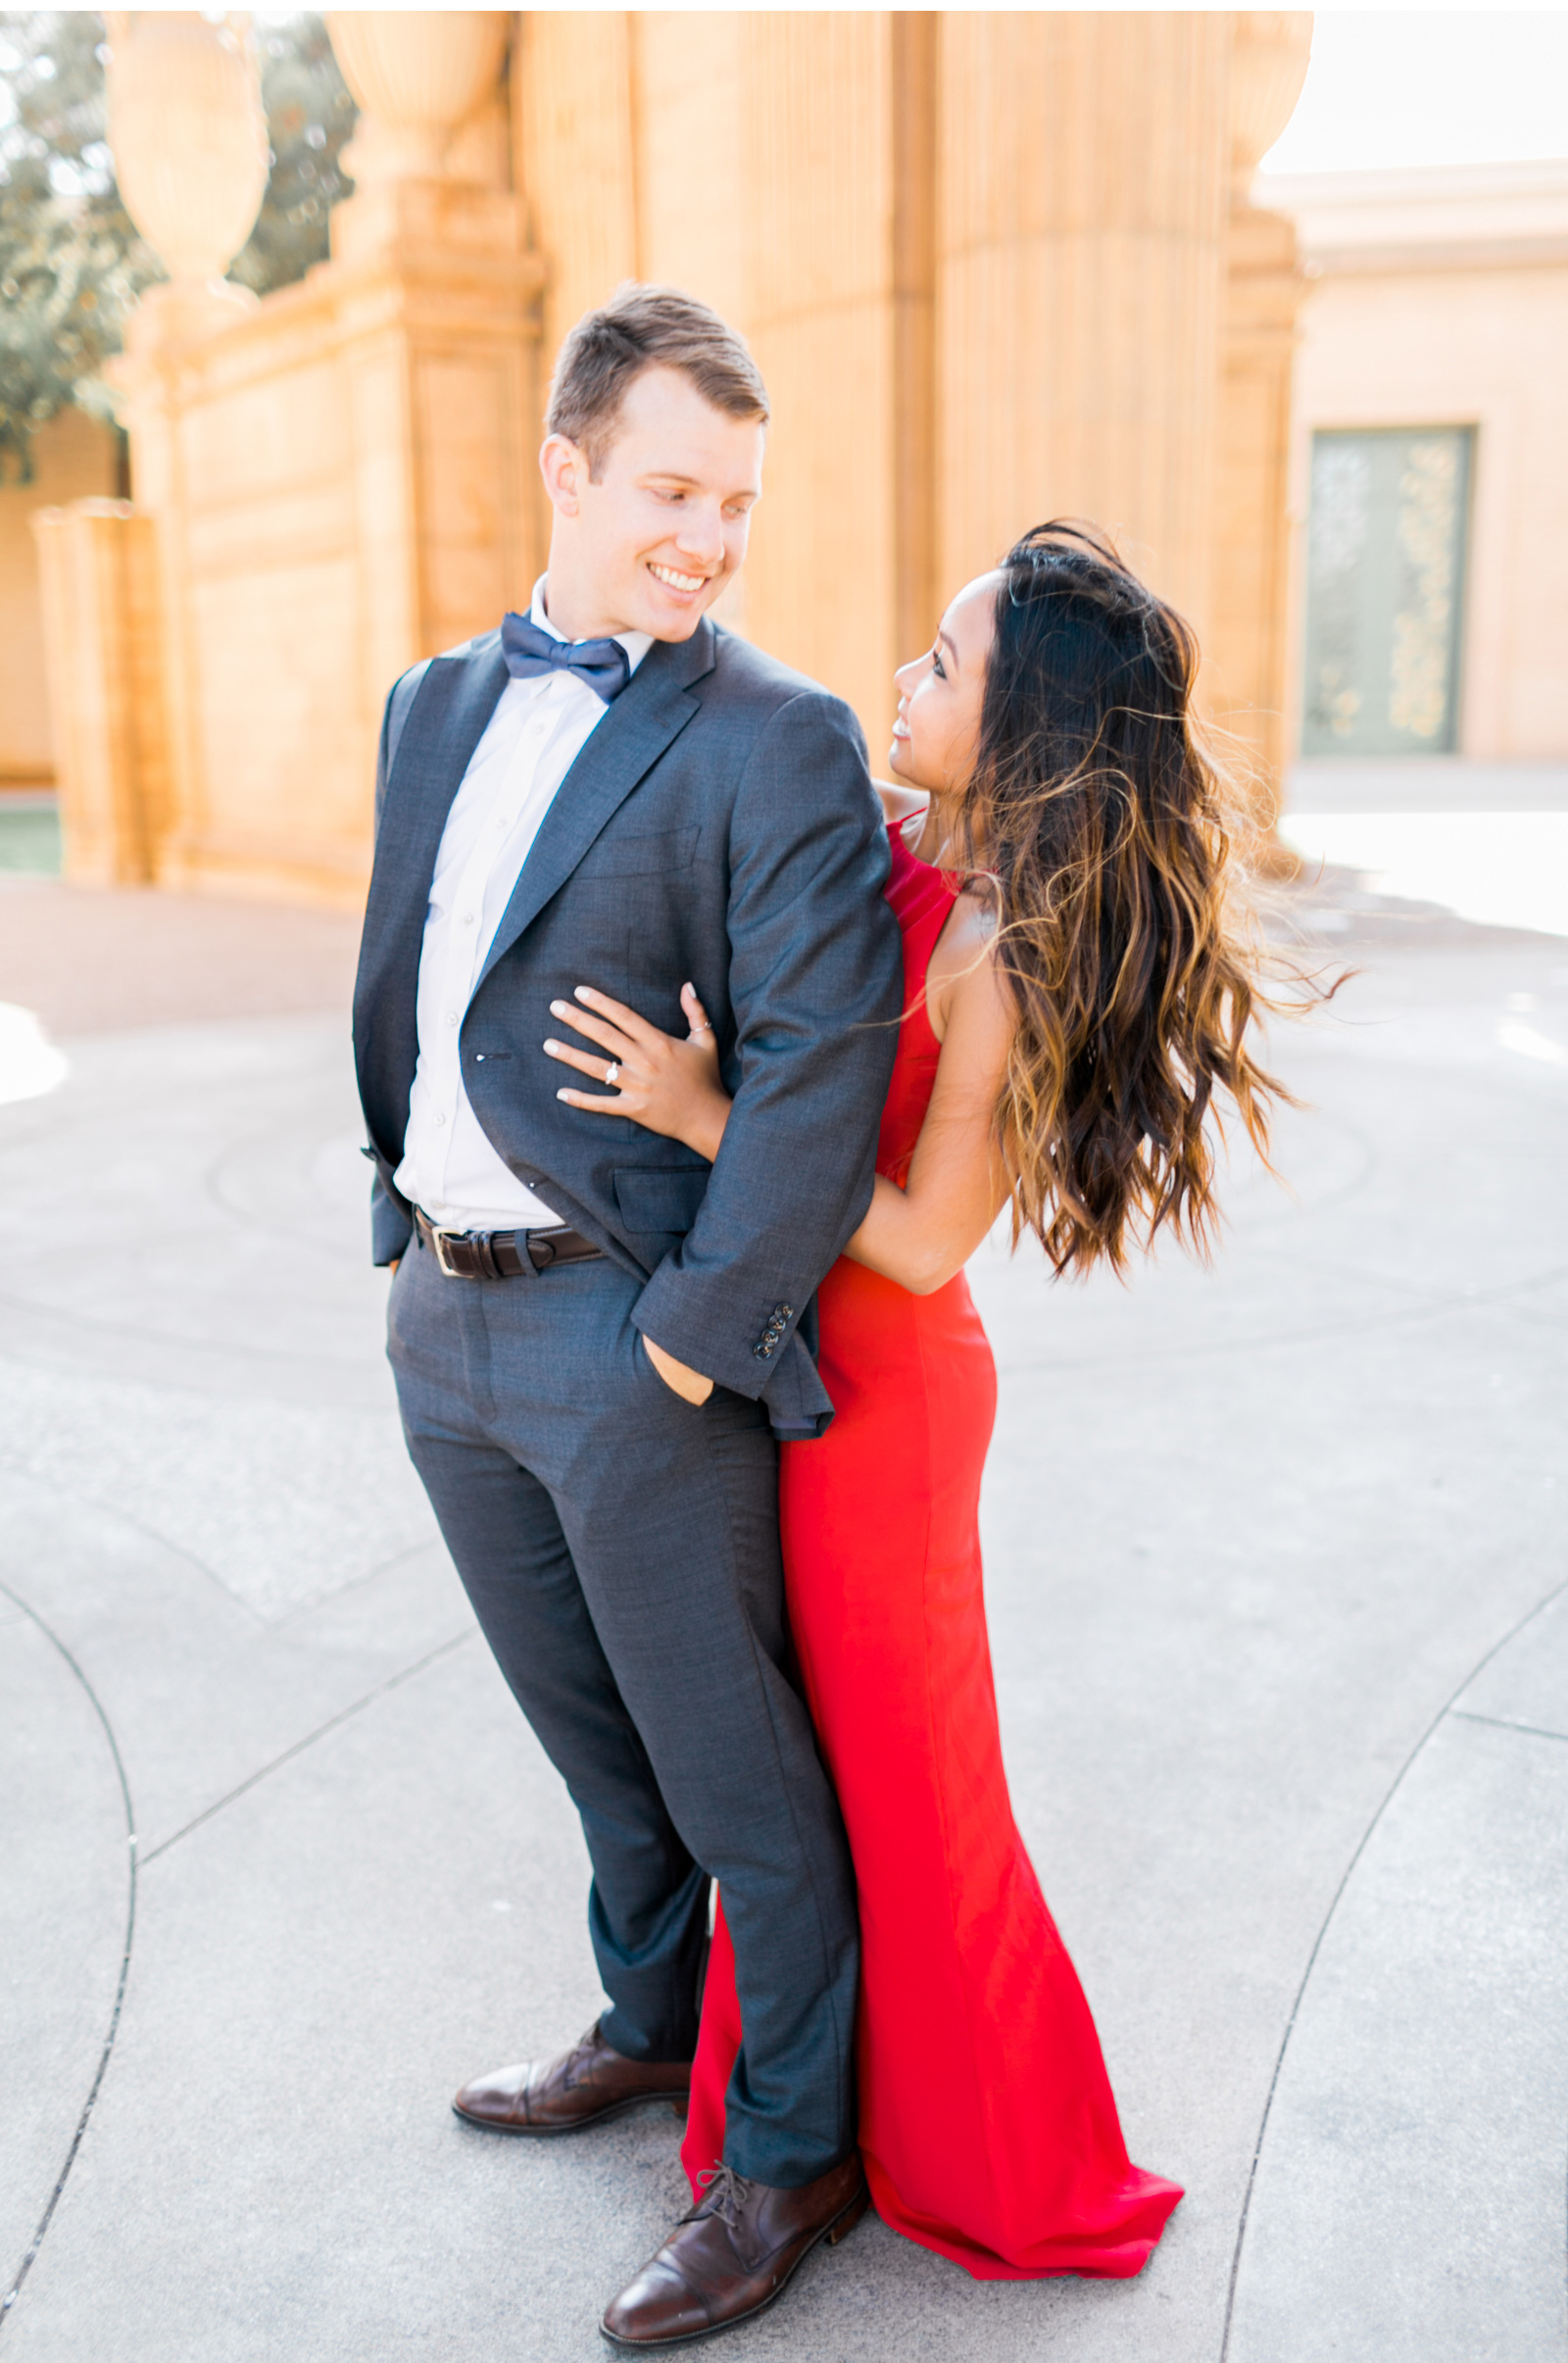 Malibu-Wedding-Photographer-Natalie-Schutt-Photography-Style-Me-Pretty_10.jpg